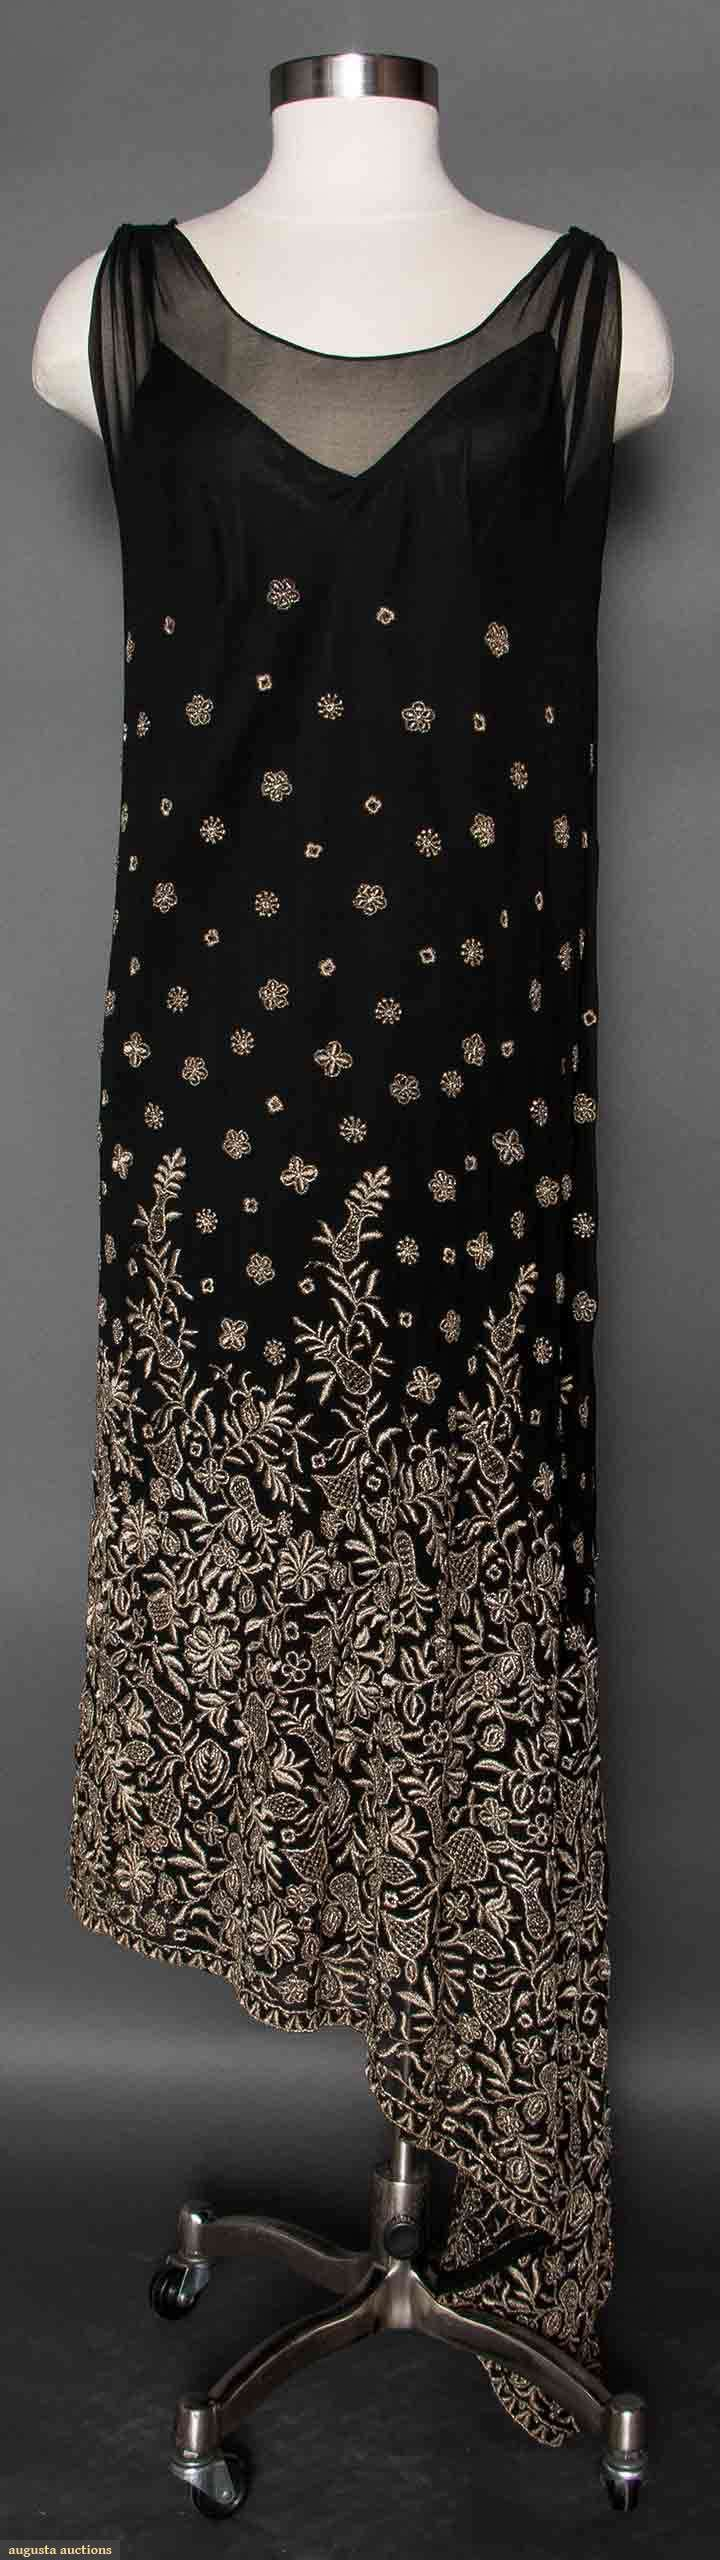 EMBROIDERED BLACK SILK DRESS, 1920s Silk chiffon, sleeveless, angled hemline, bottom skirt half densely embroidered in metallic silver floral pattern